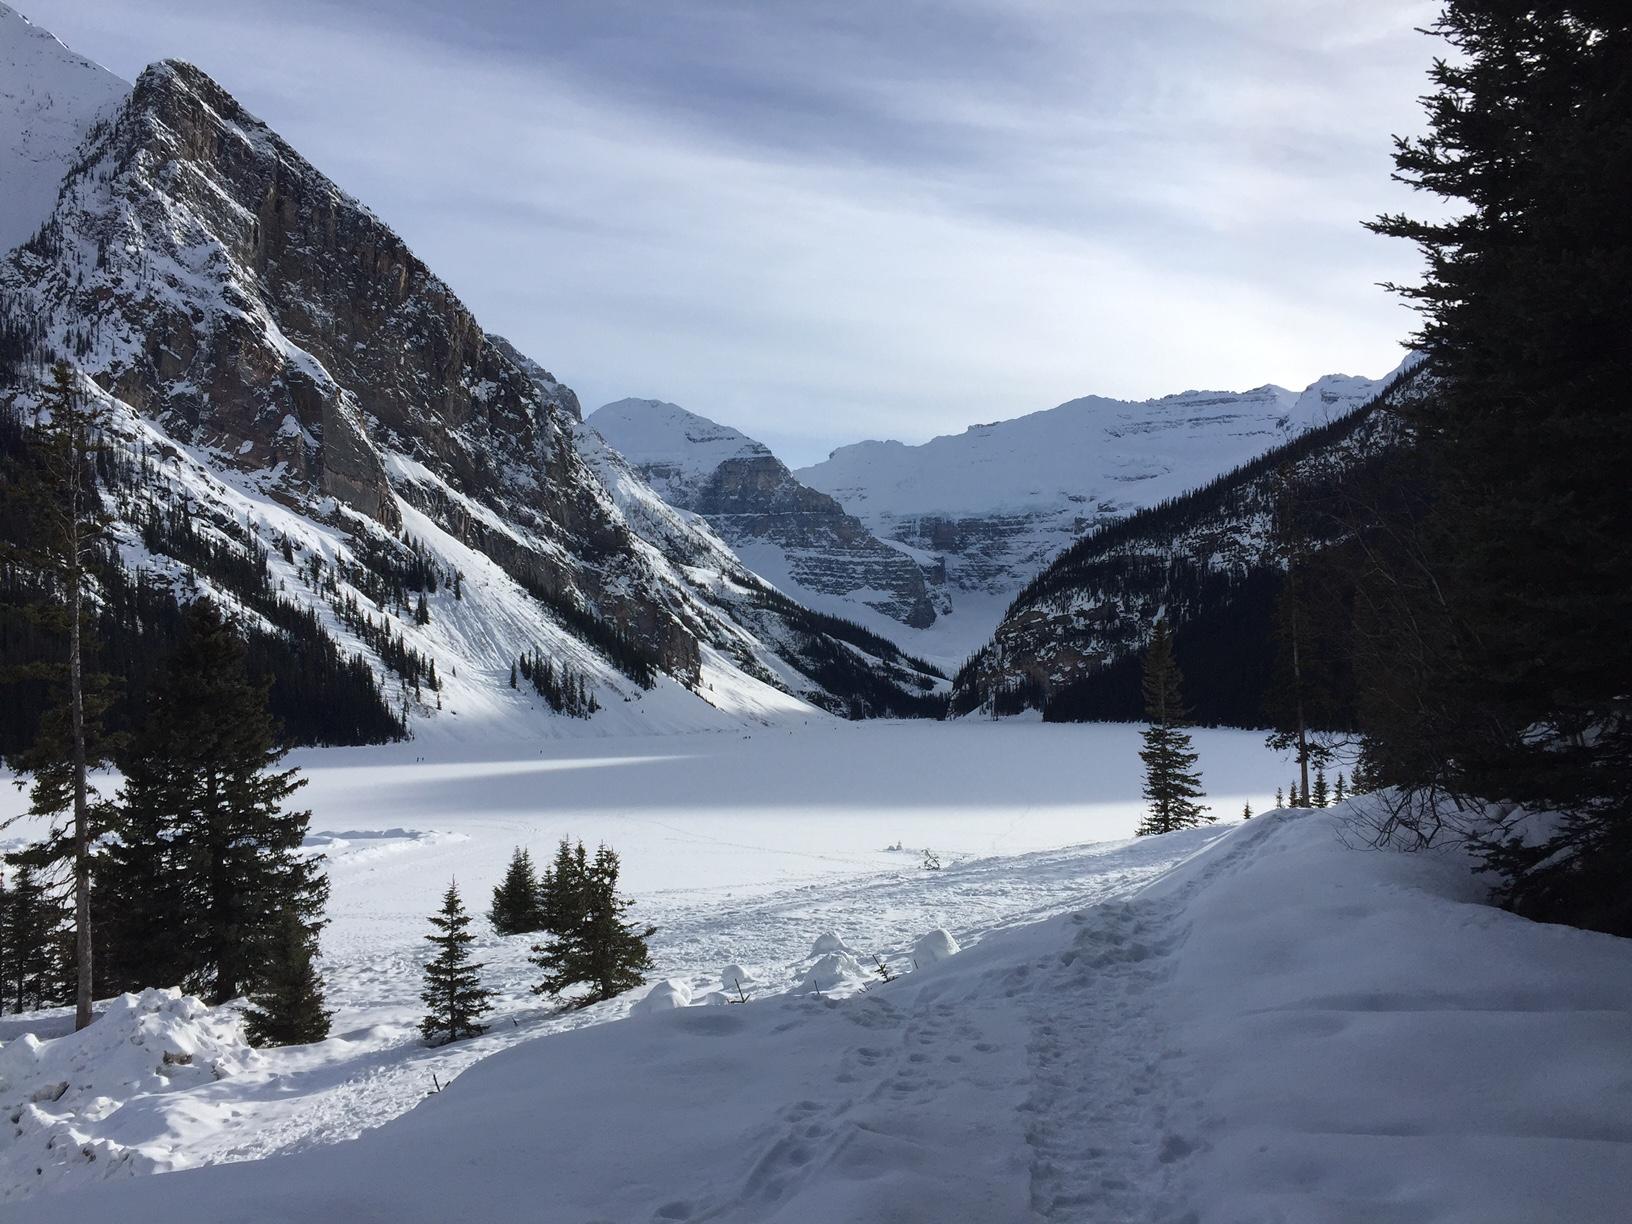 Mirror Lake - worth the climb!